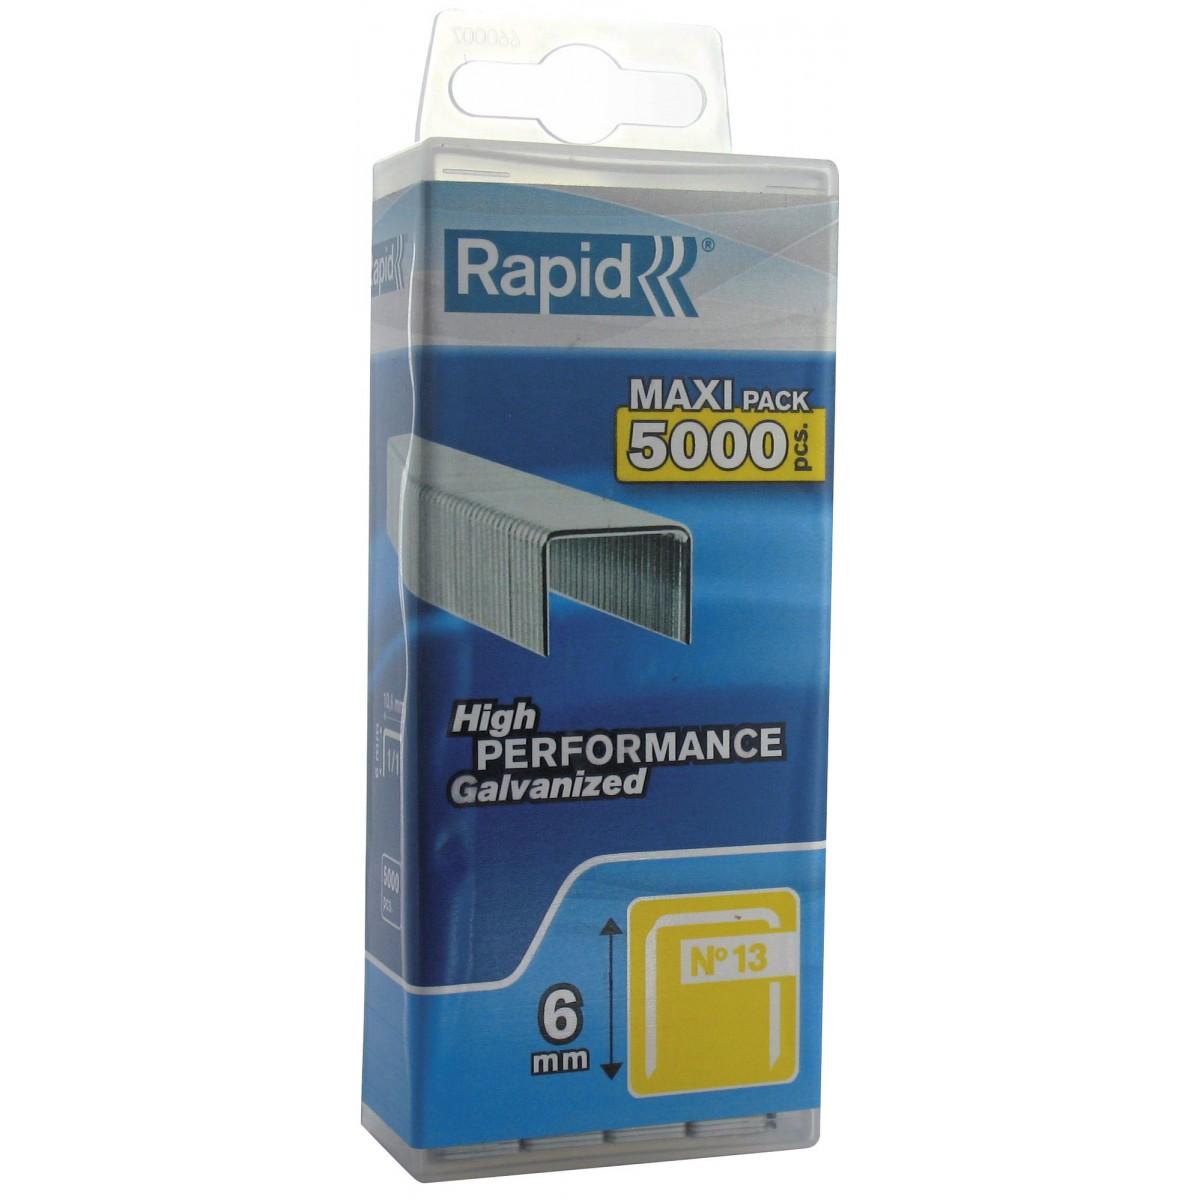 Agrafe n°13 Rapid Agraf - Hauteur 6 mm - 5000 agrafes